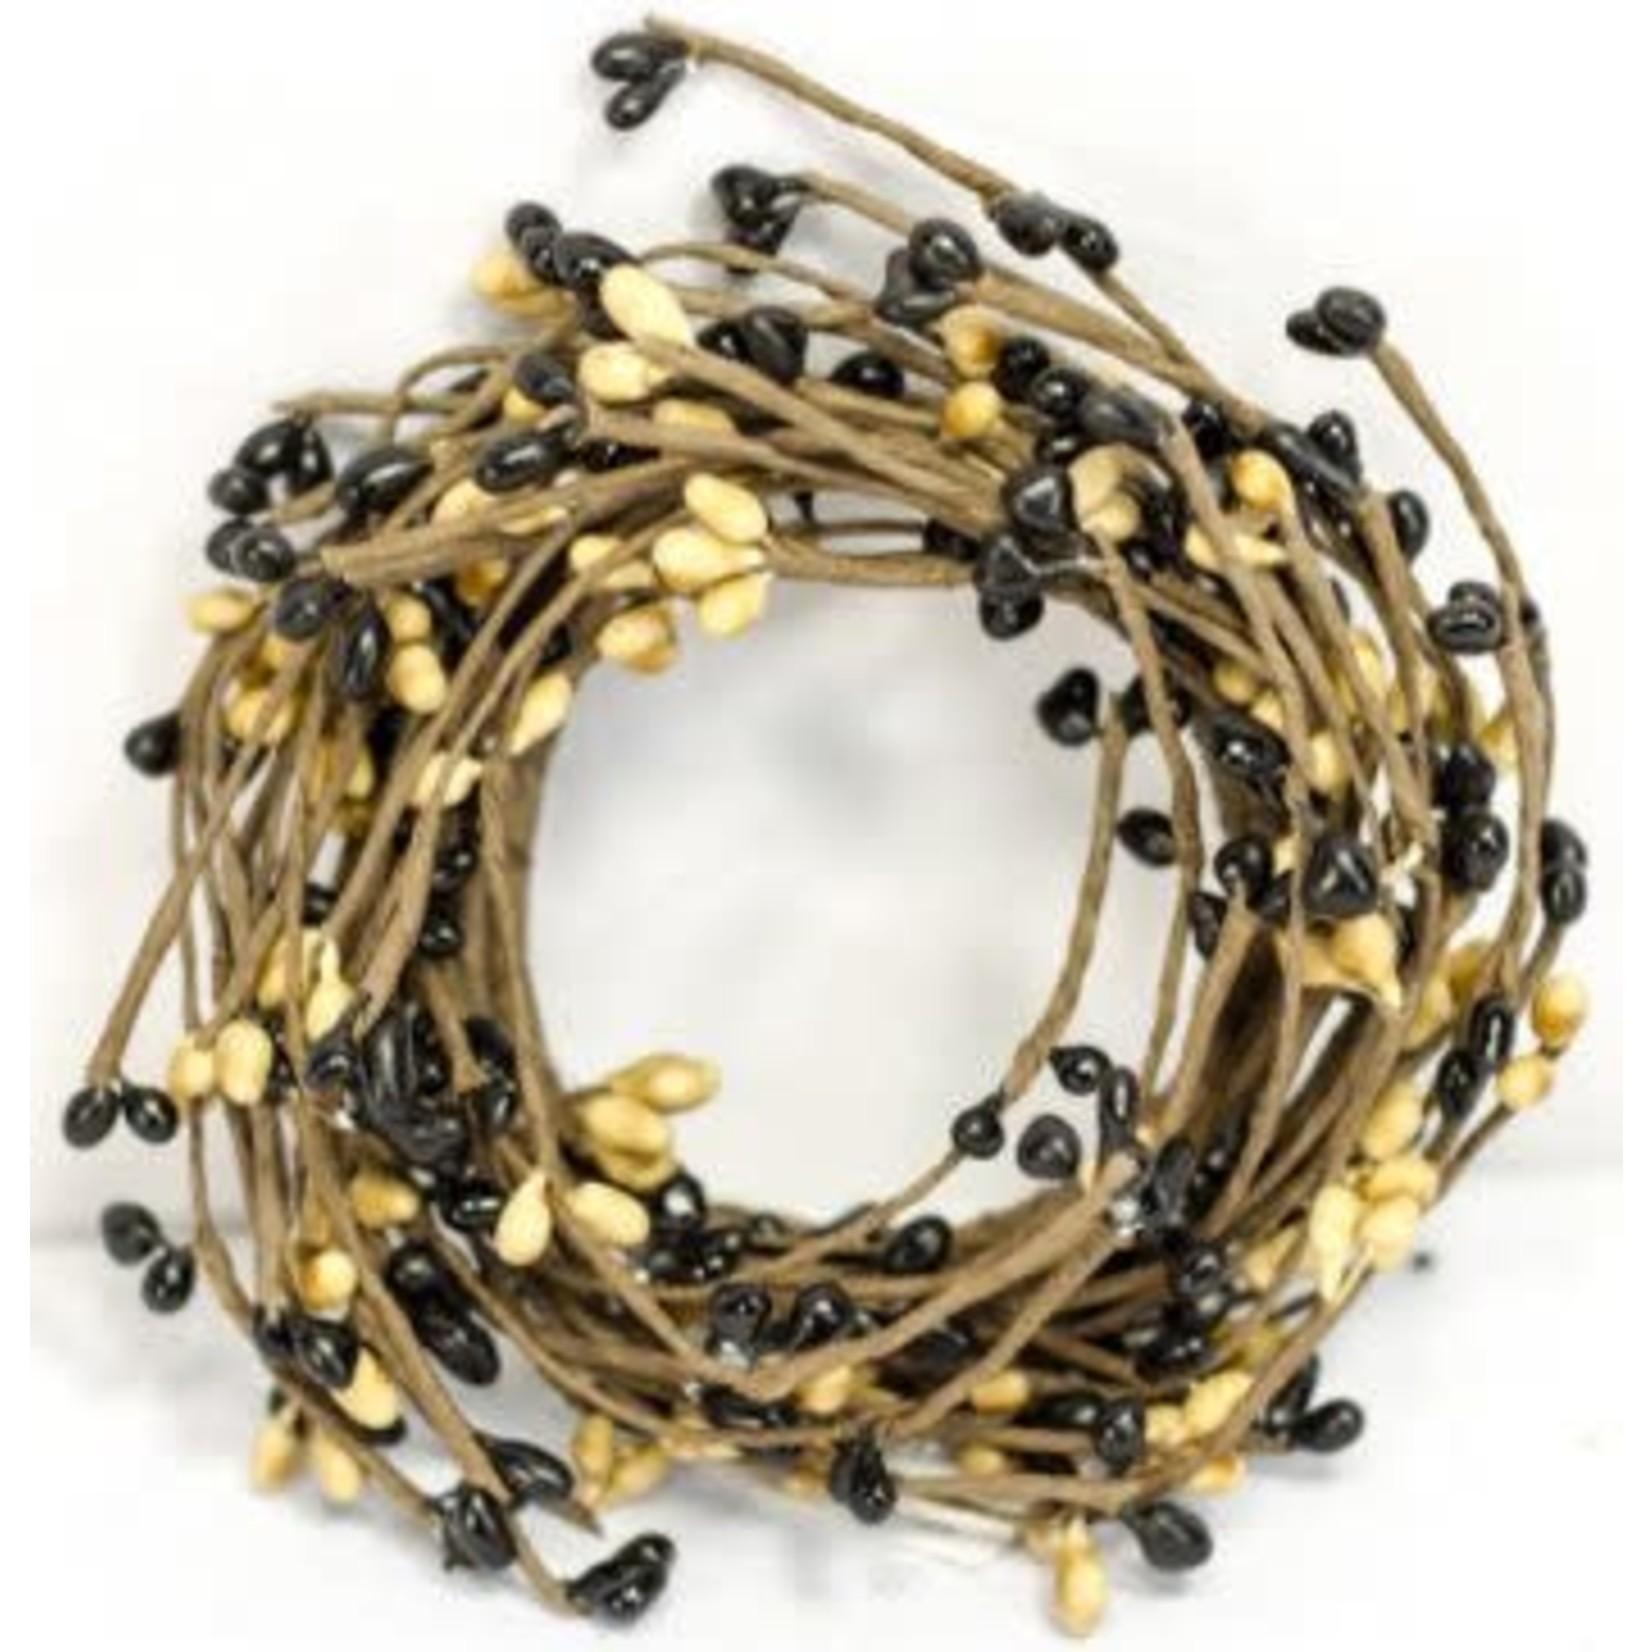 Black/Tan Candle Ring